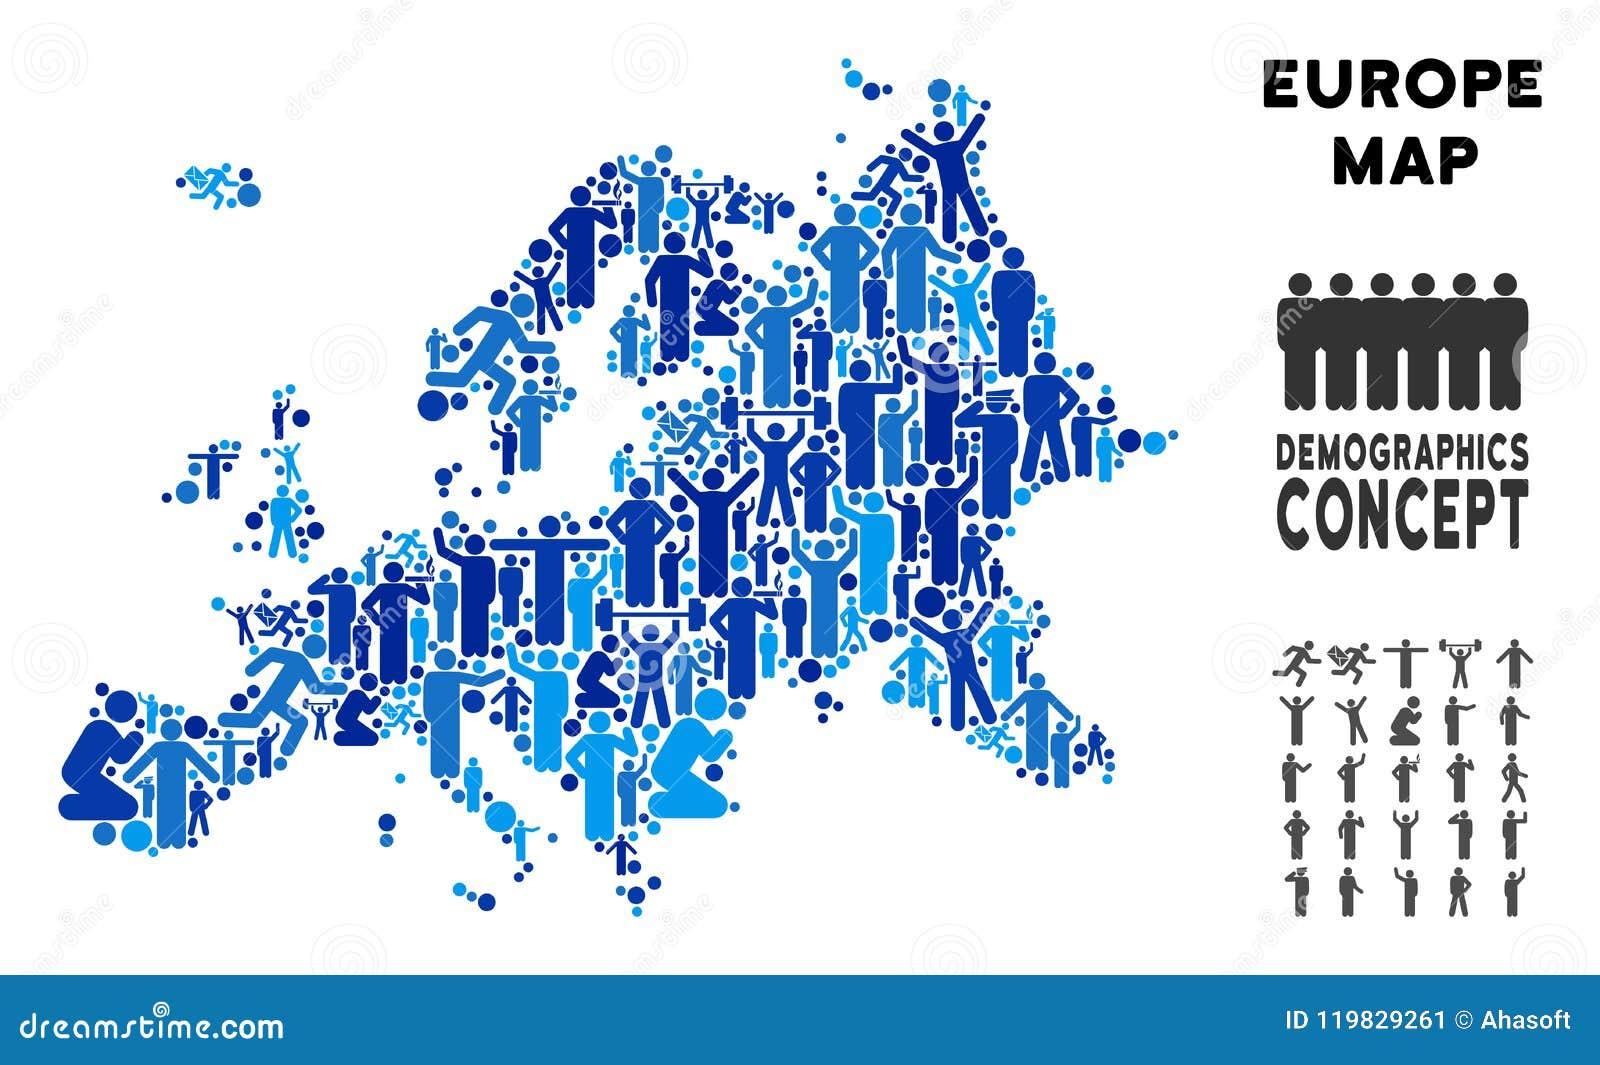 Demography Map on